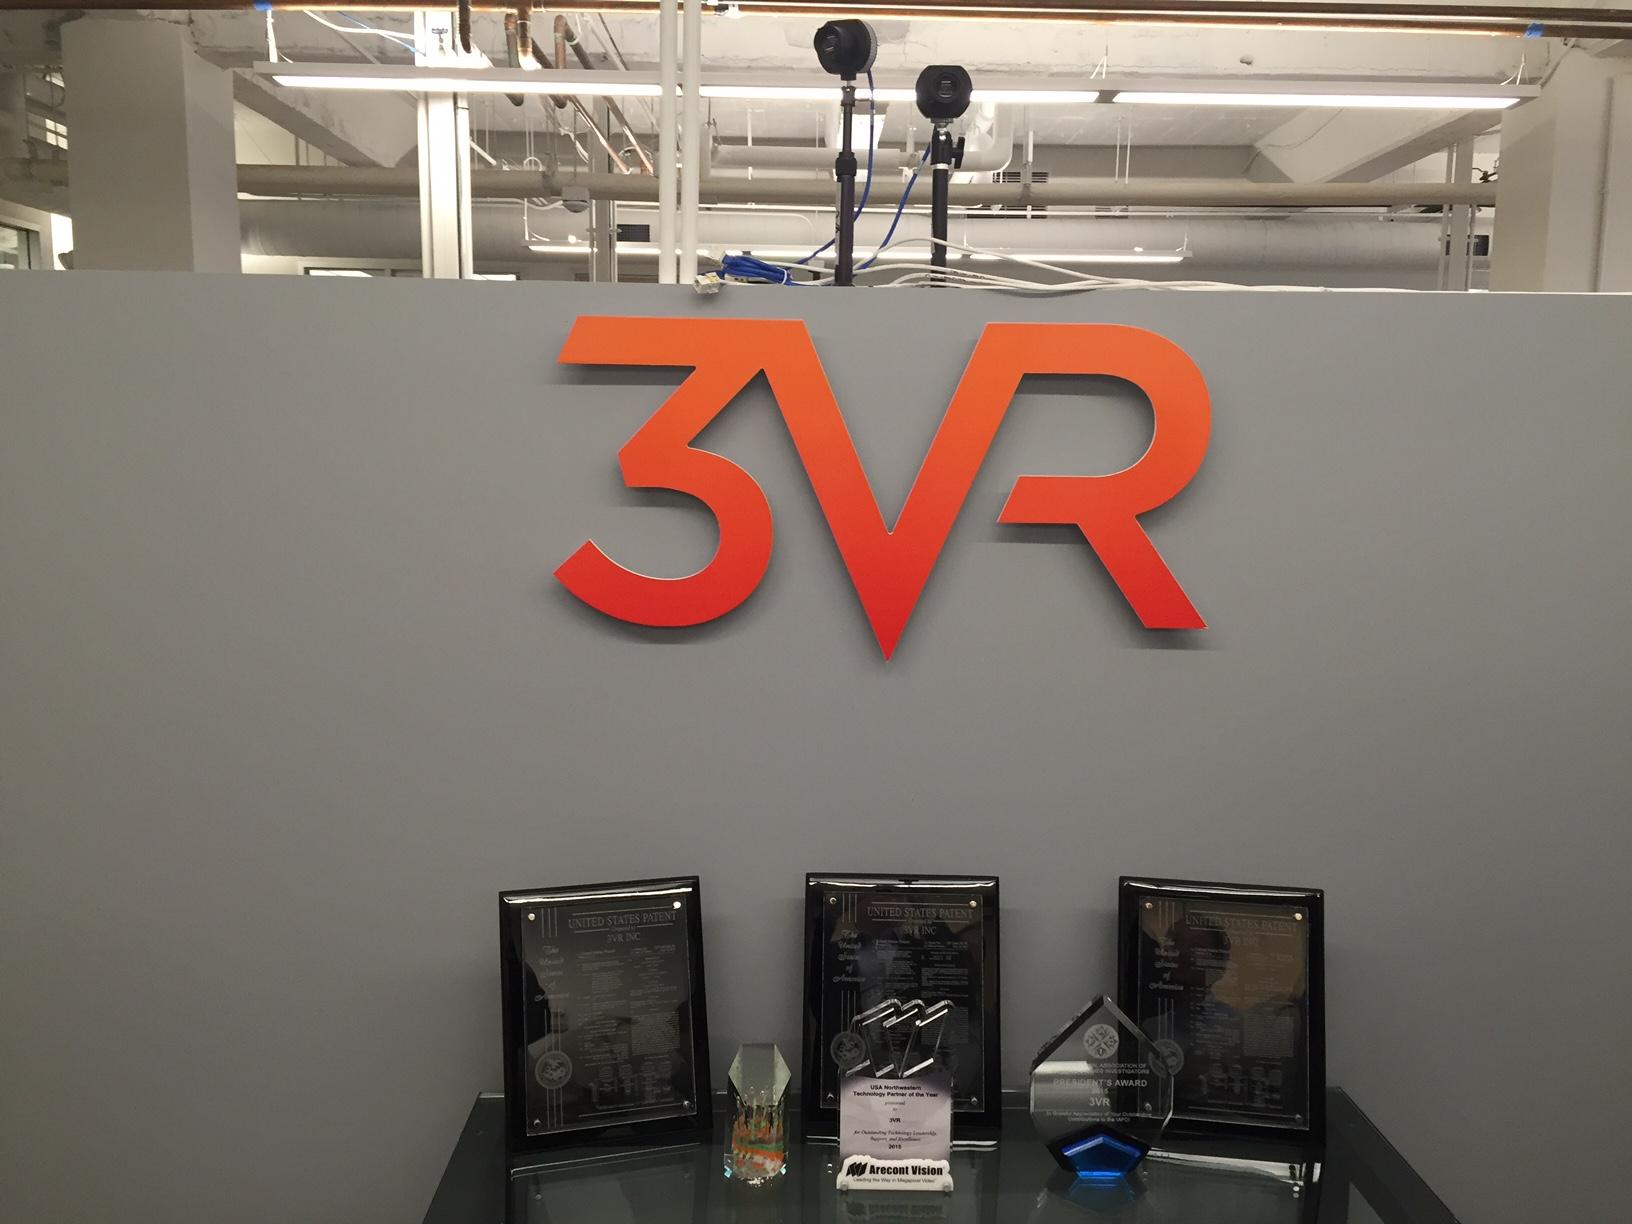 3VR HQ lobby, San Francisco, CA